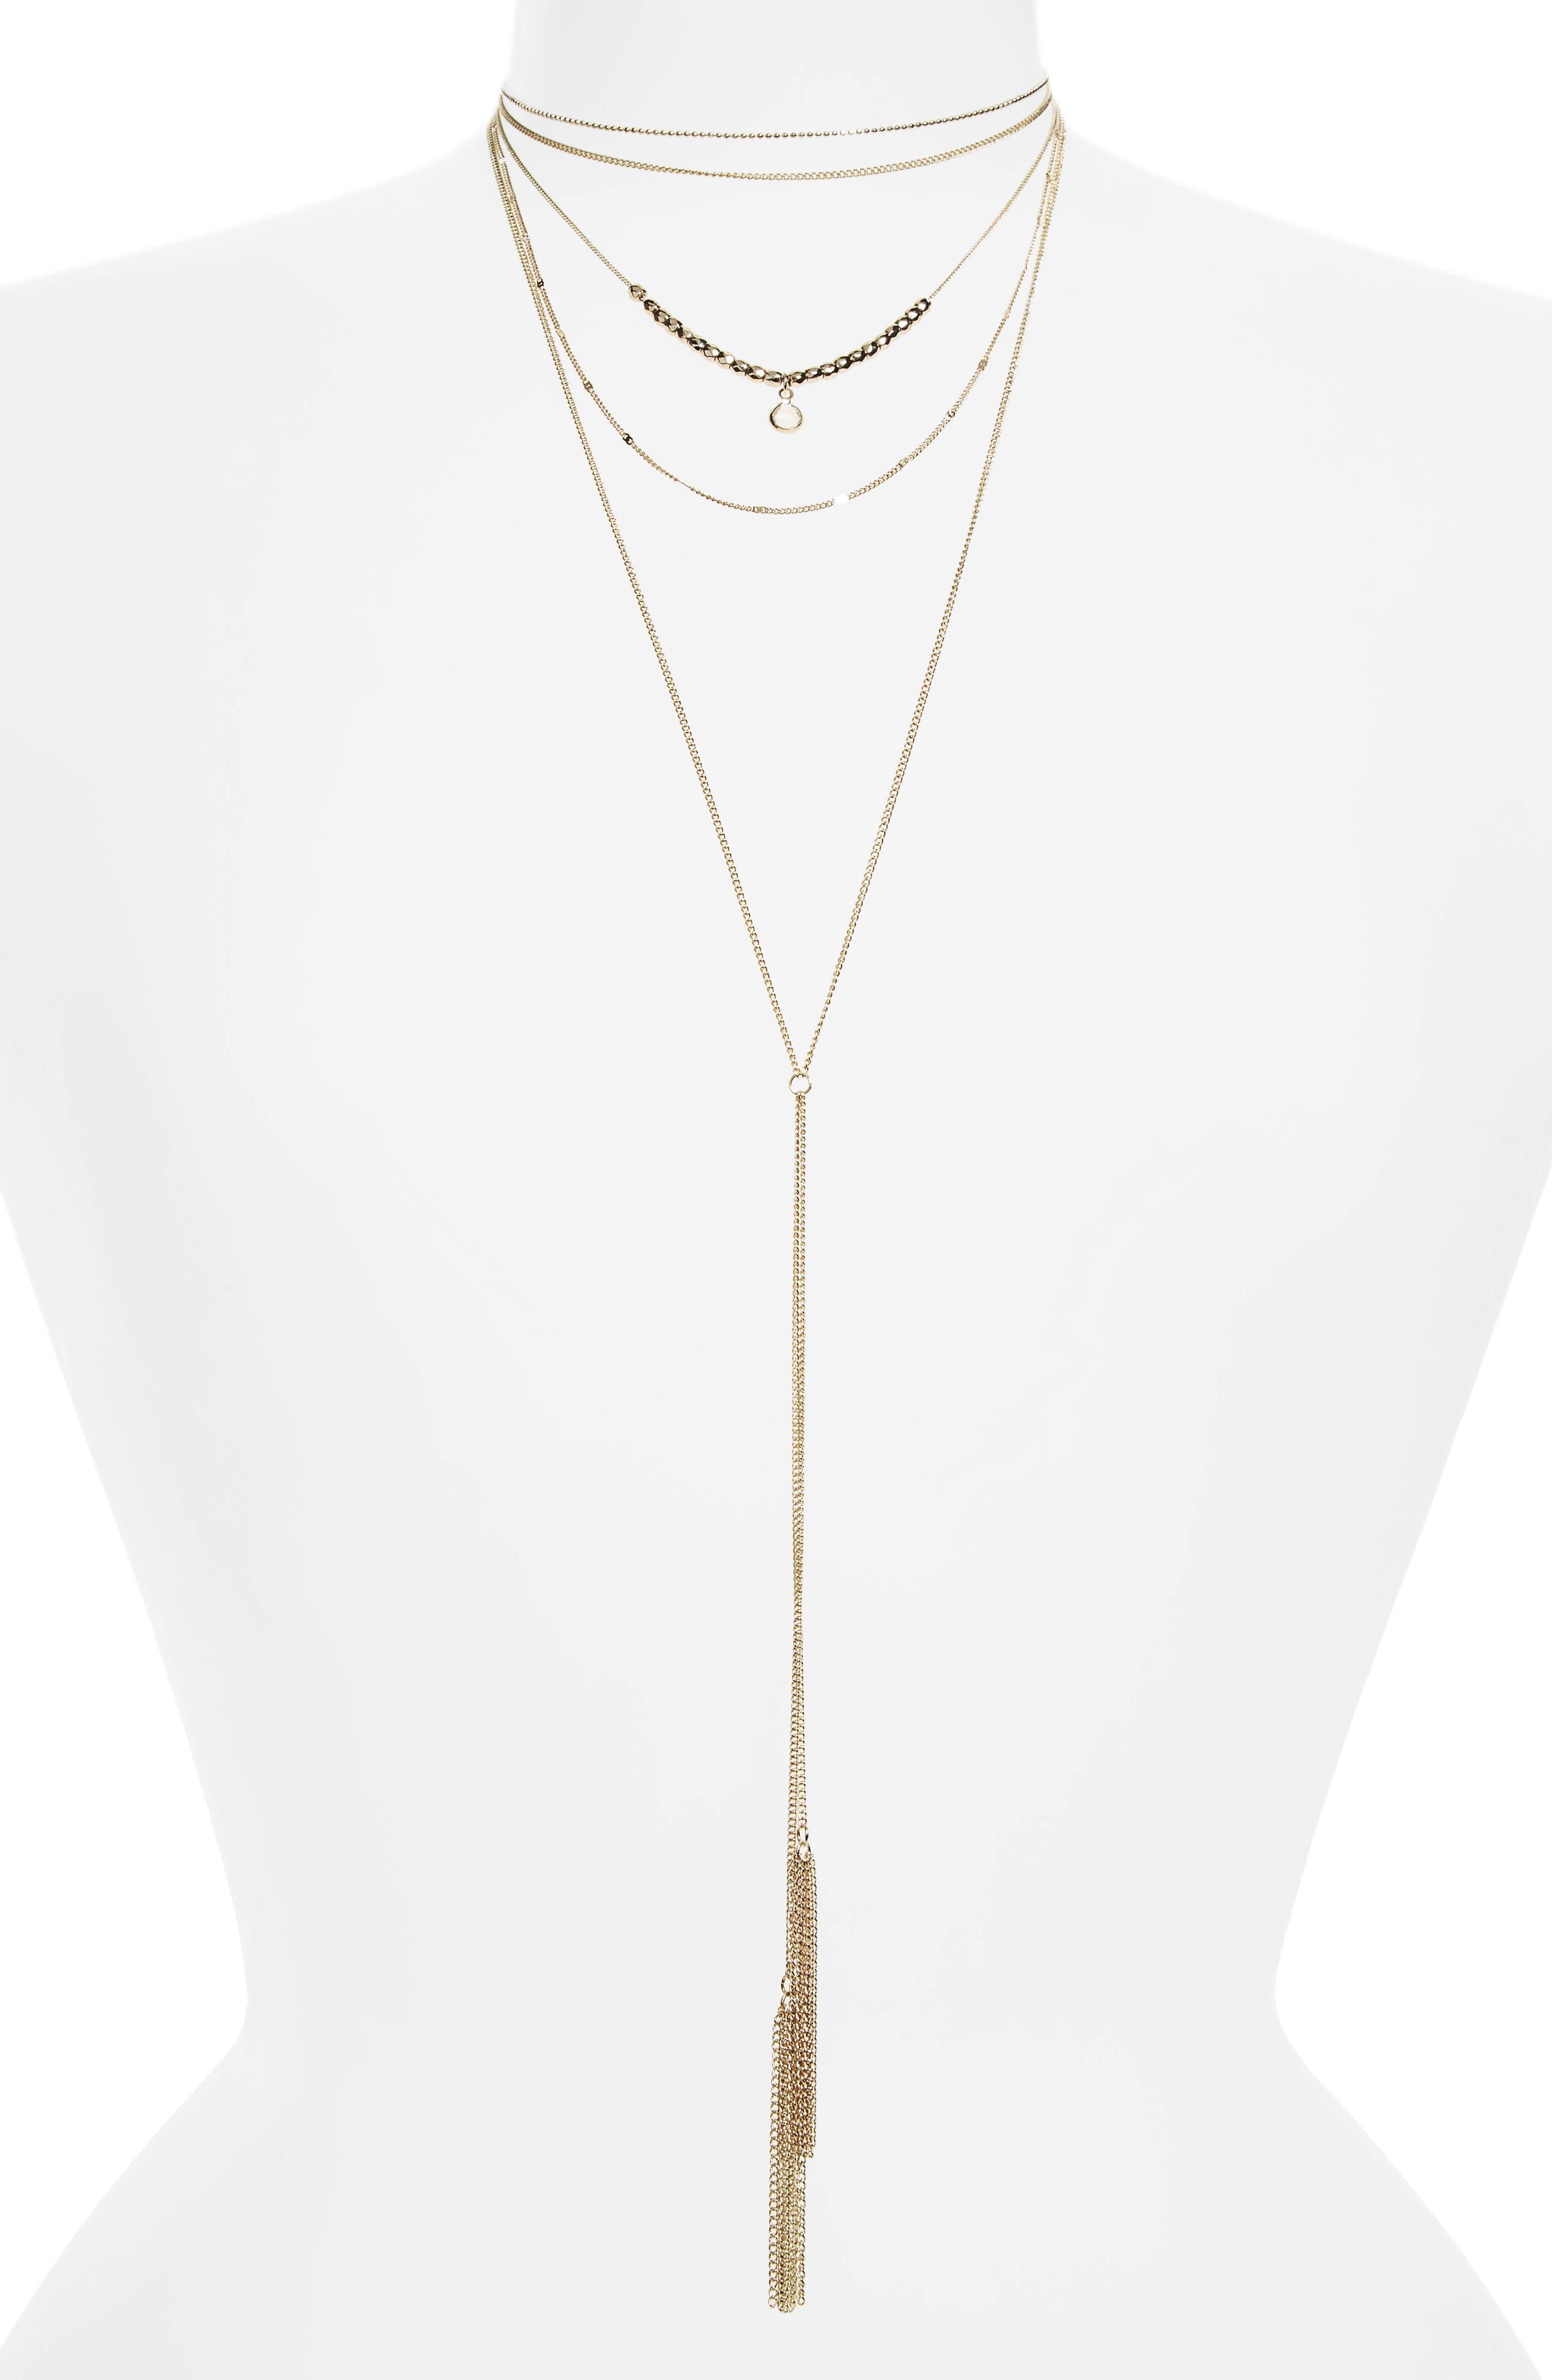 TOPSHOP Multistrand Tassel Necklace, Main, color, 710